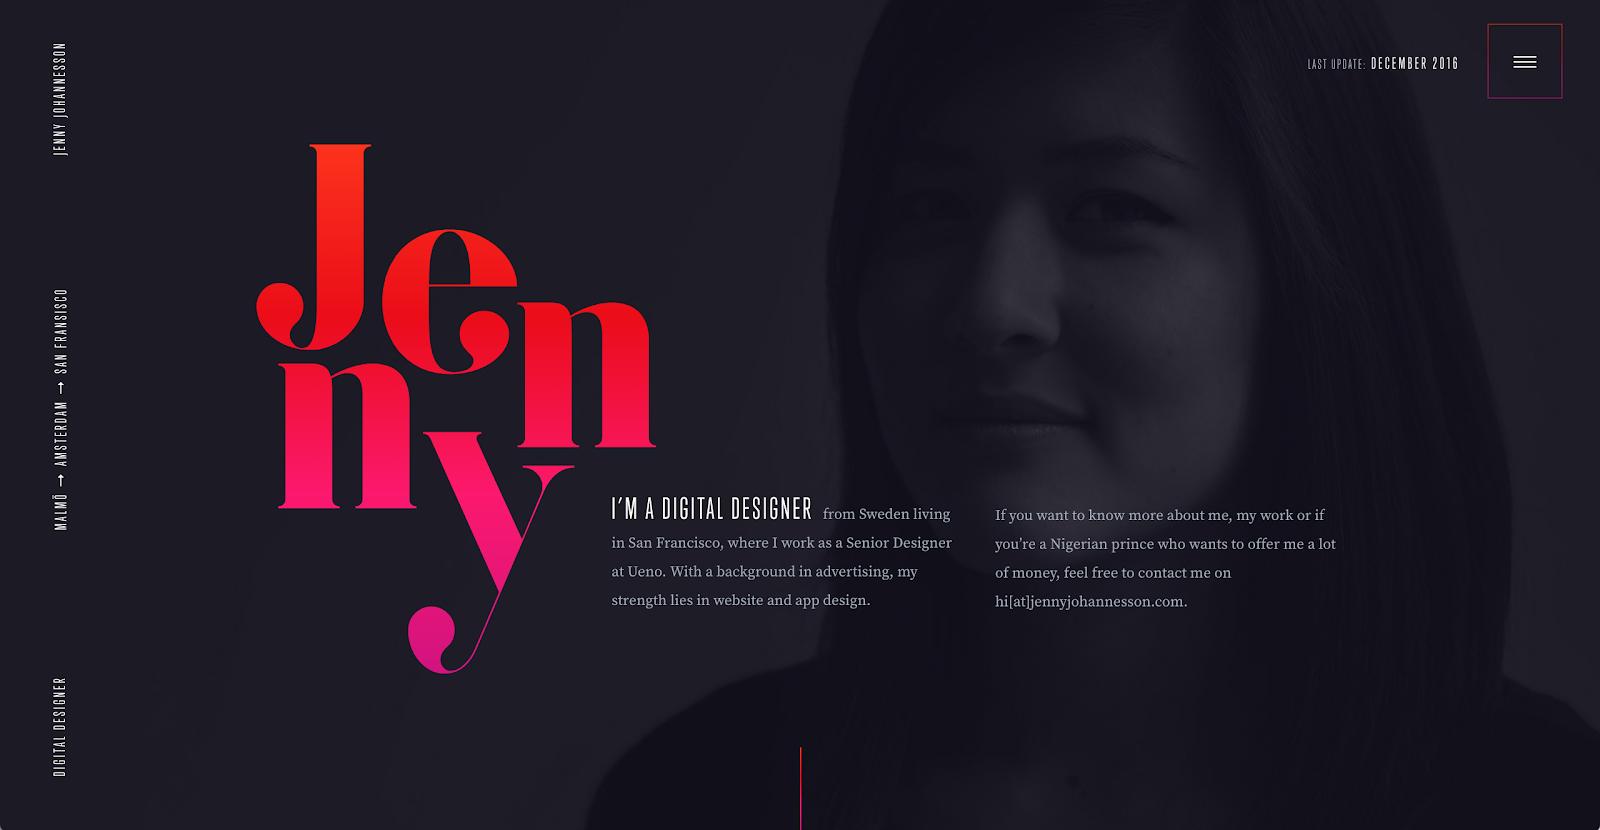 Book en ligne de l'agence digitale Femme Fatale